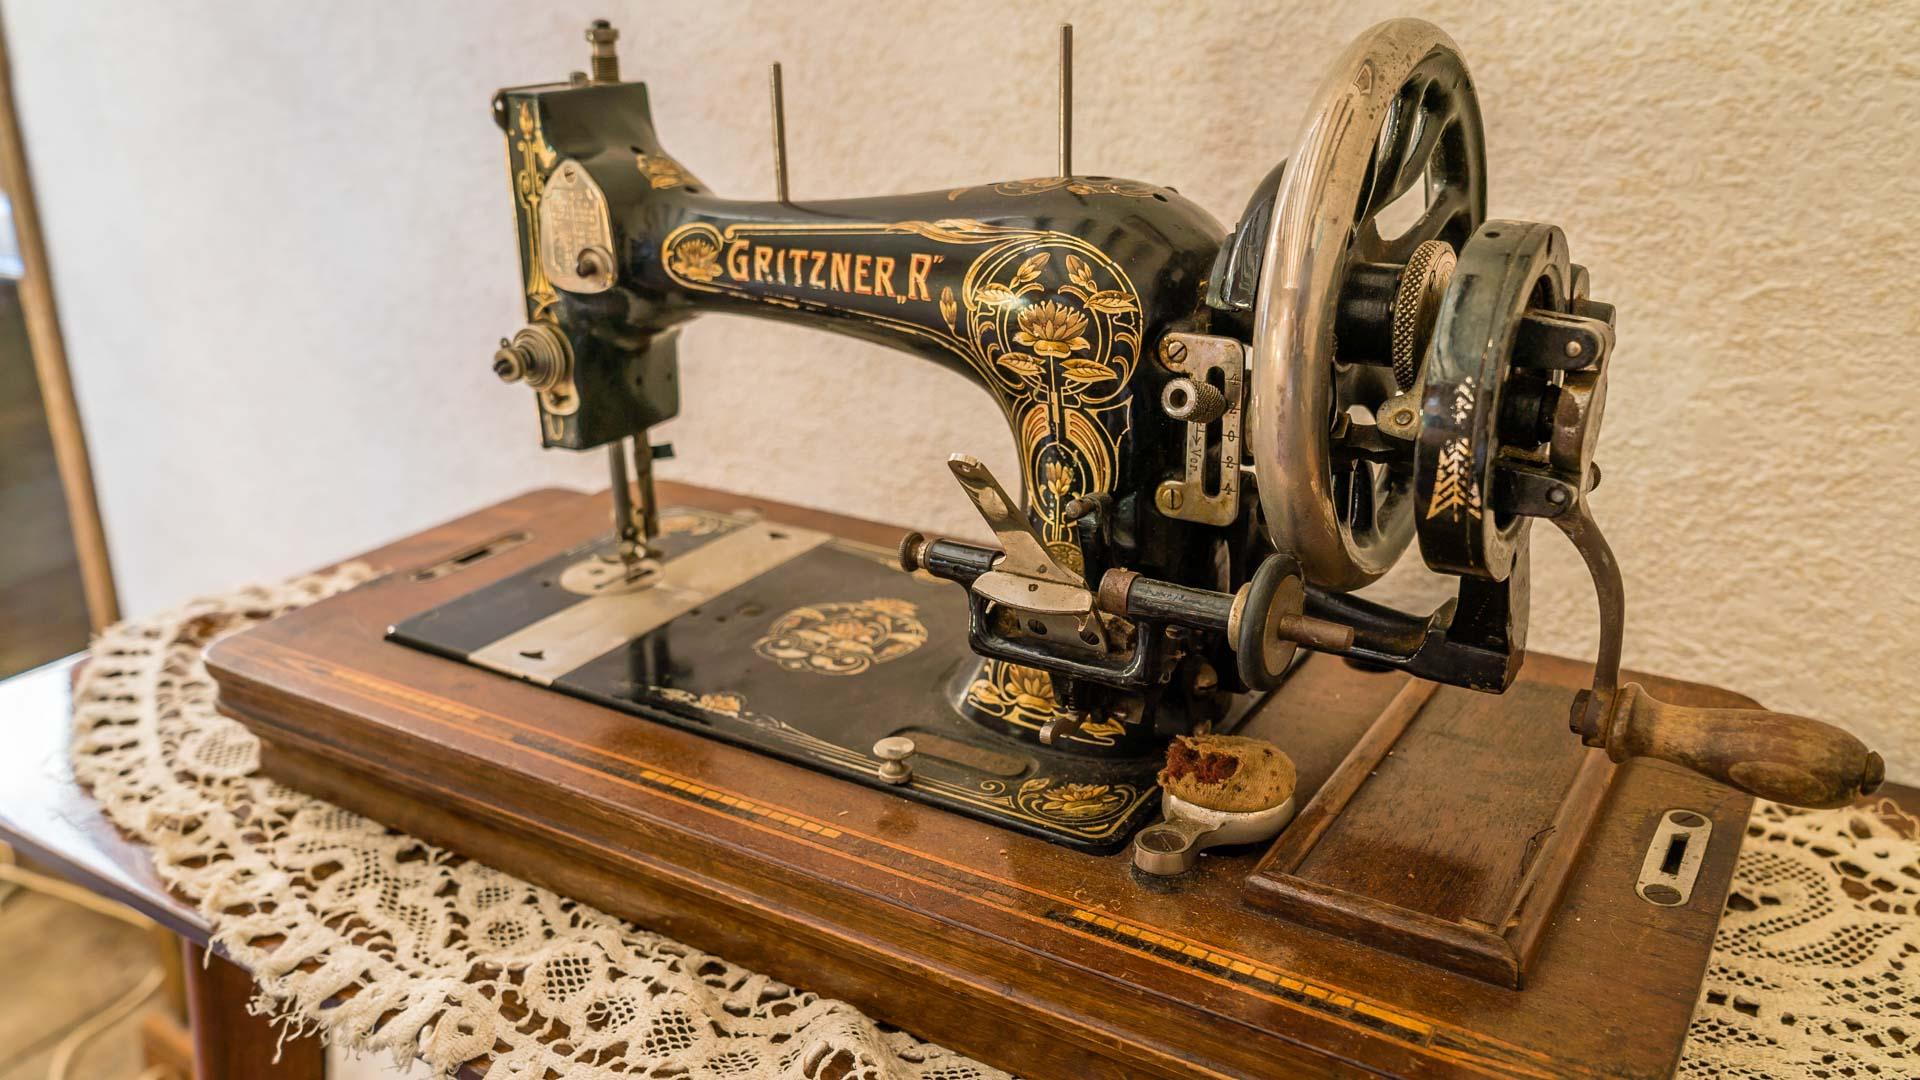 Machine à coudre Gritzner